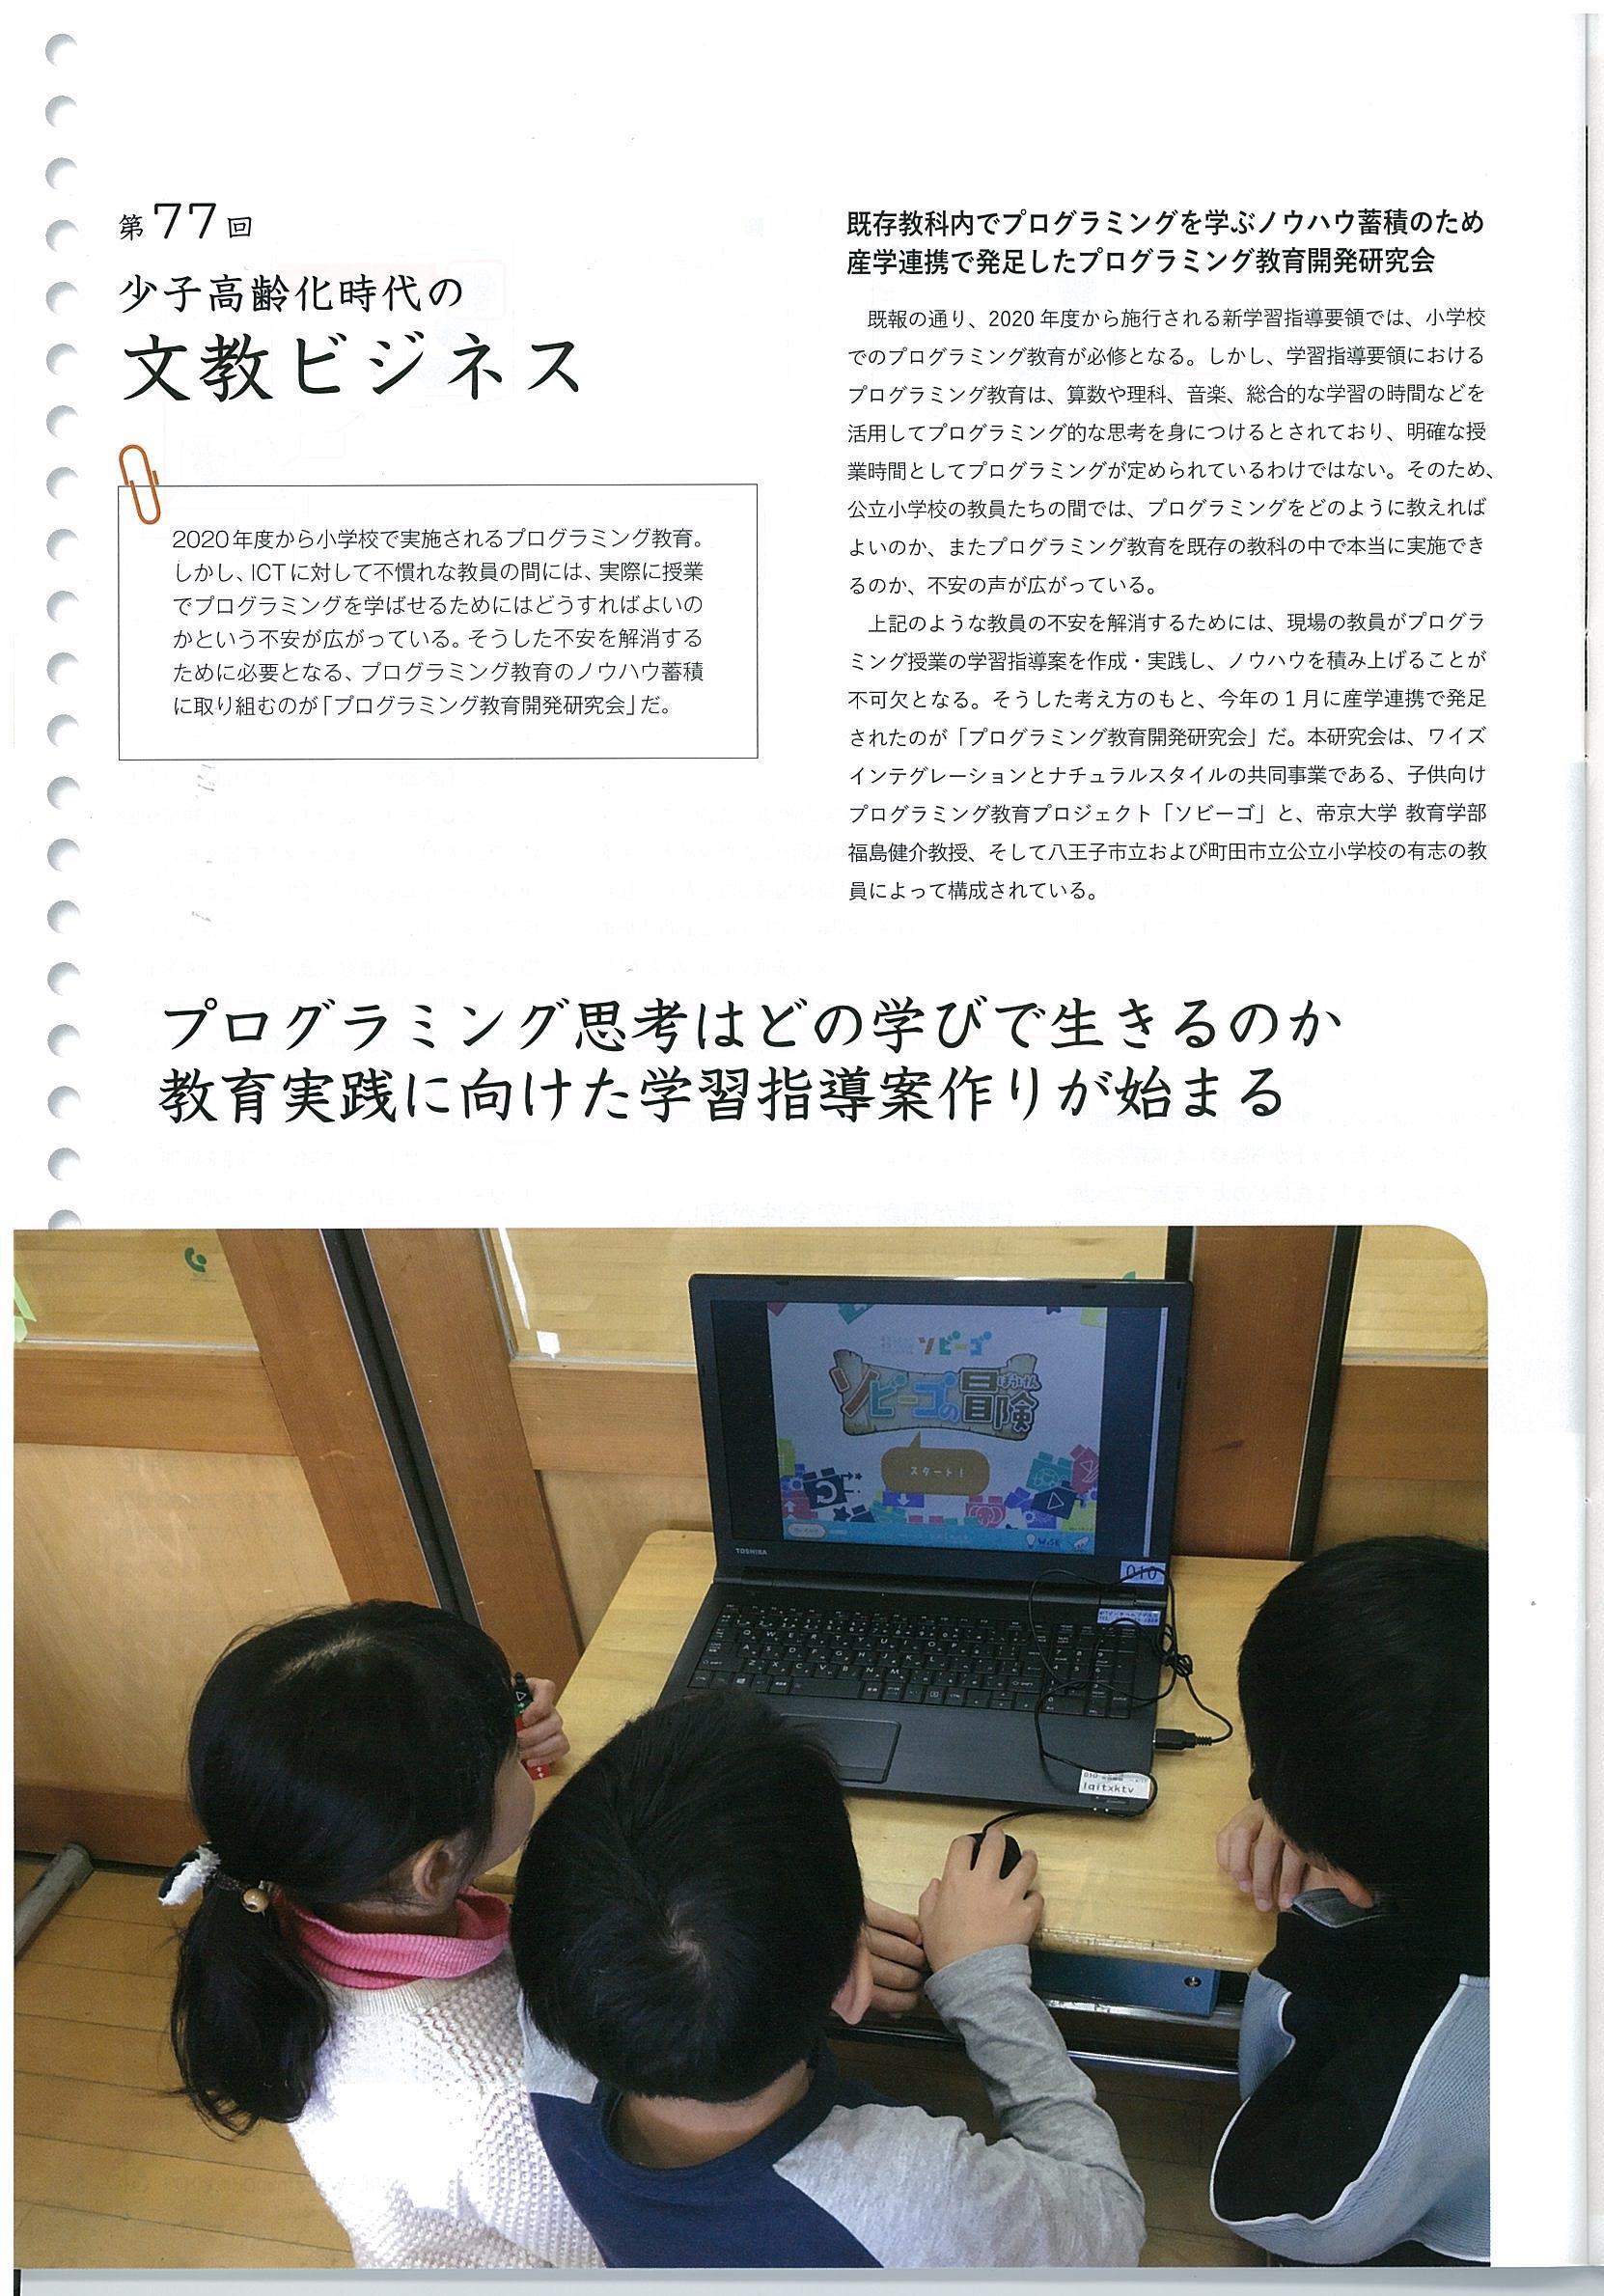 PC-Webzine10月号でソビーゴが紹介されました